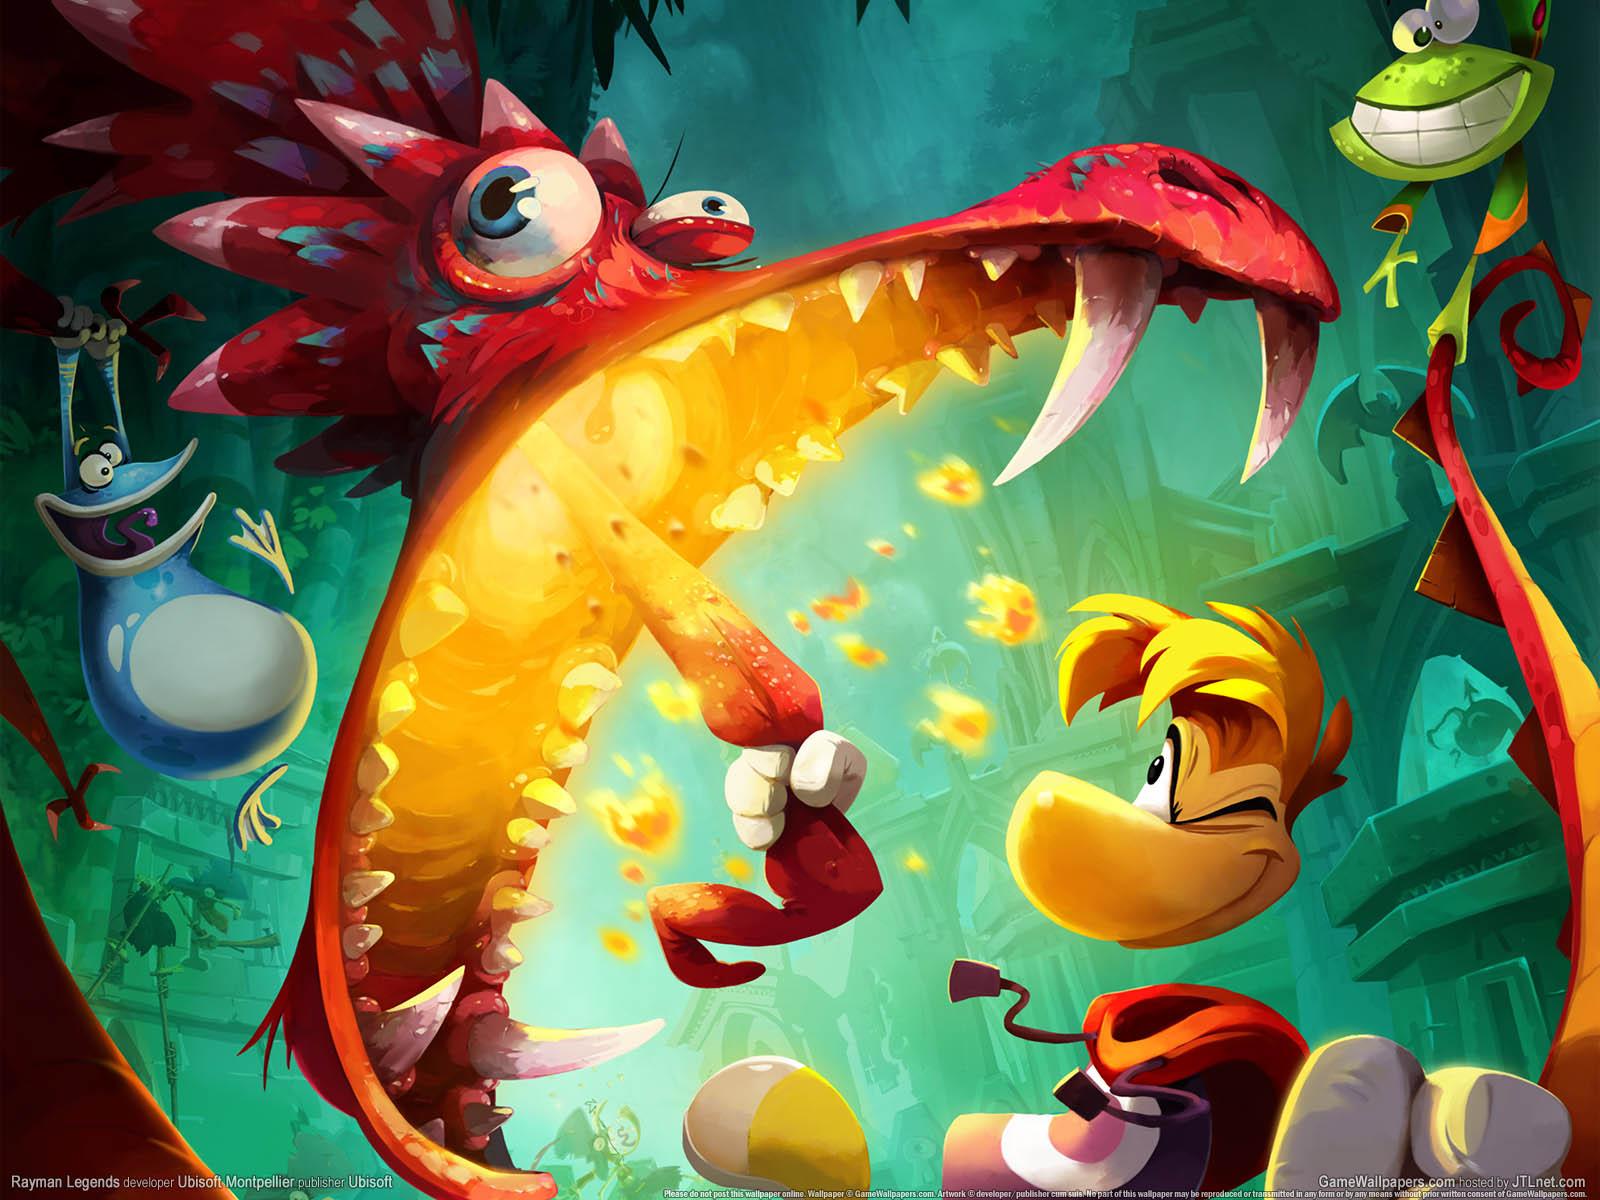 Rayman Legendsνmmer=03 achtergrond  1600x1200